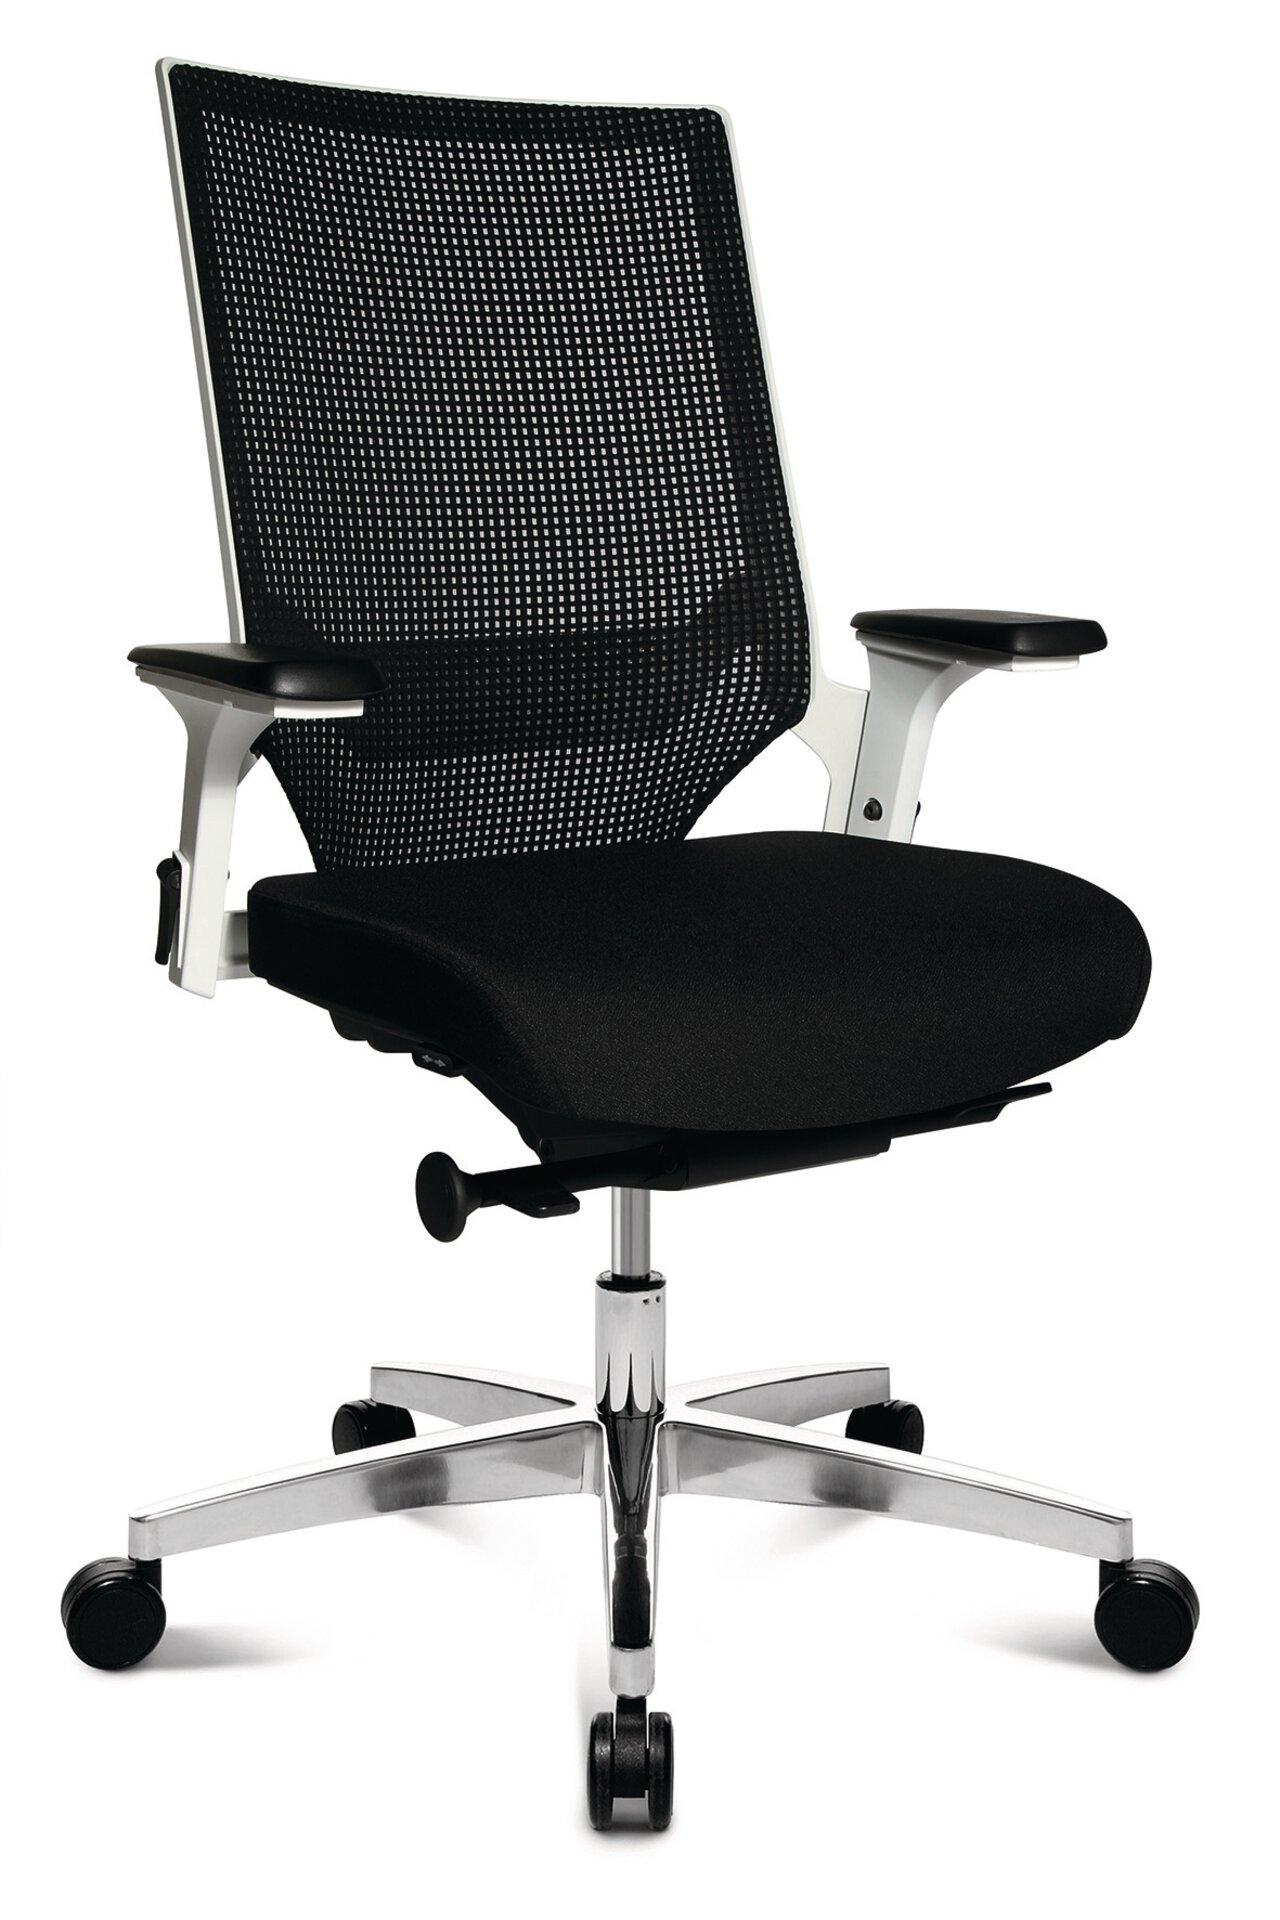 Büro-Drehstuhl M3 MONDO Textil schwarz 49 x 103 x 48 cm